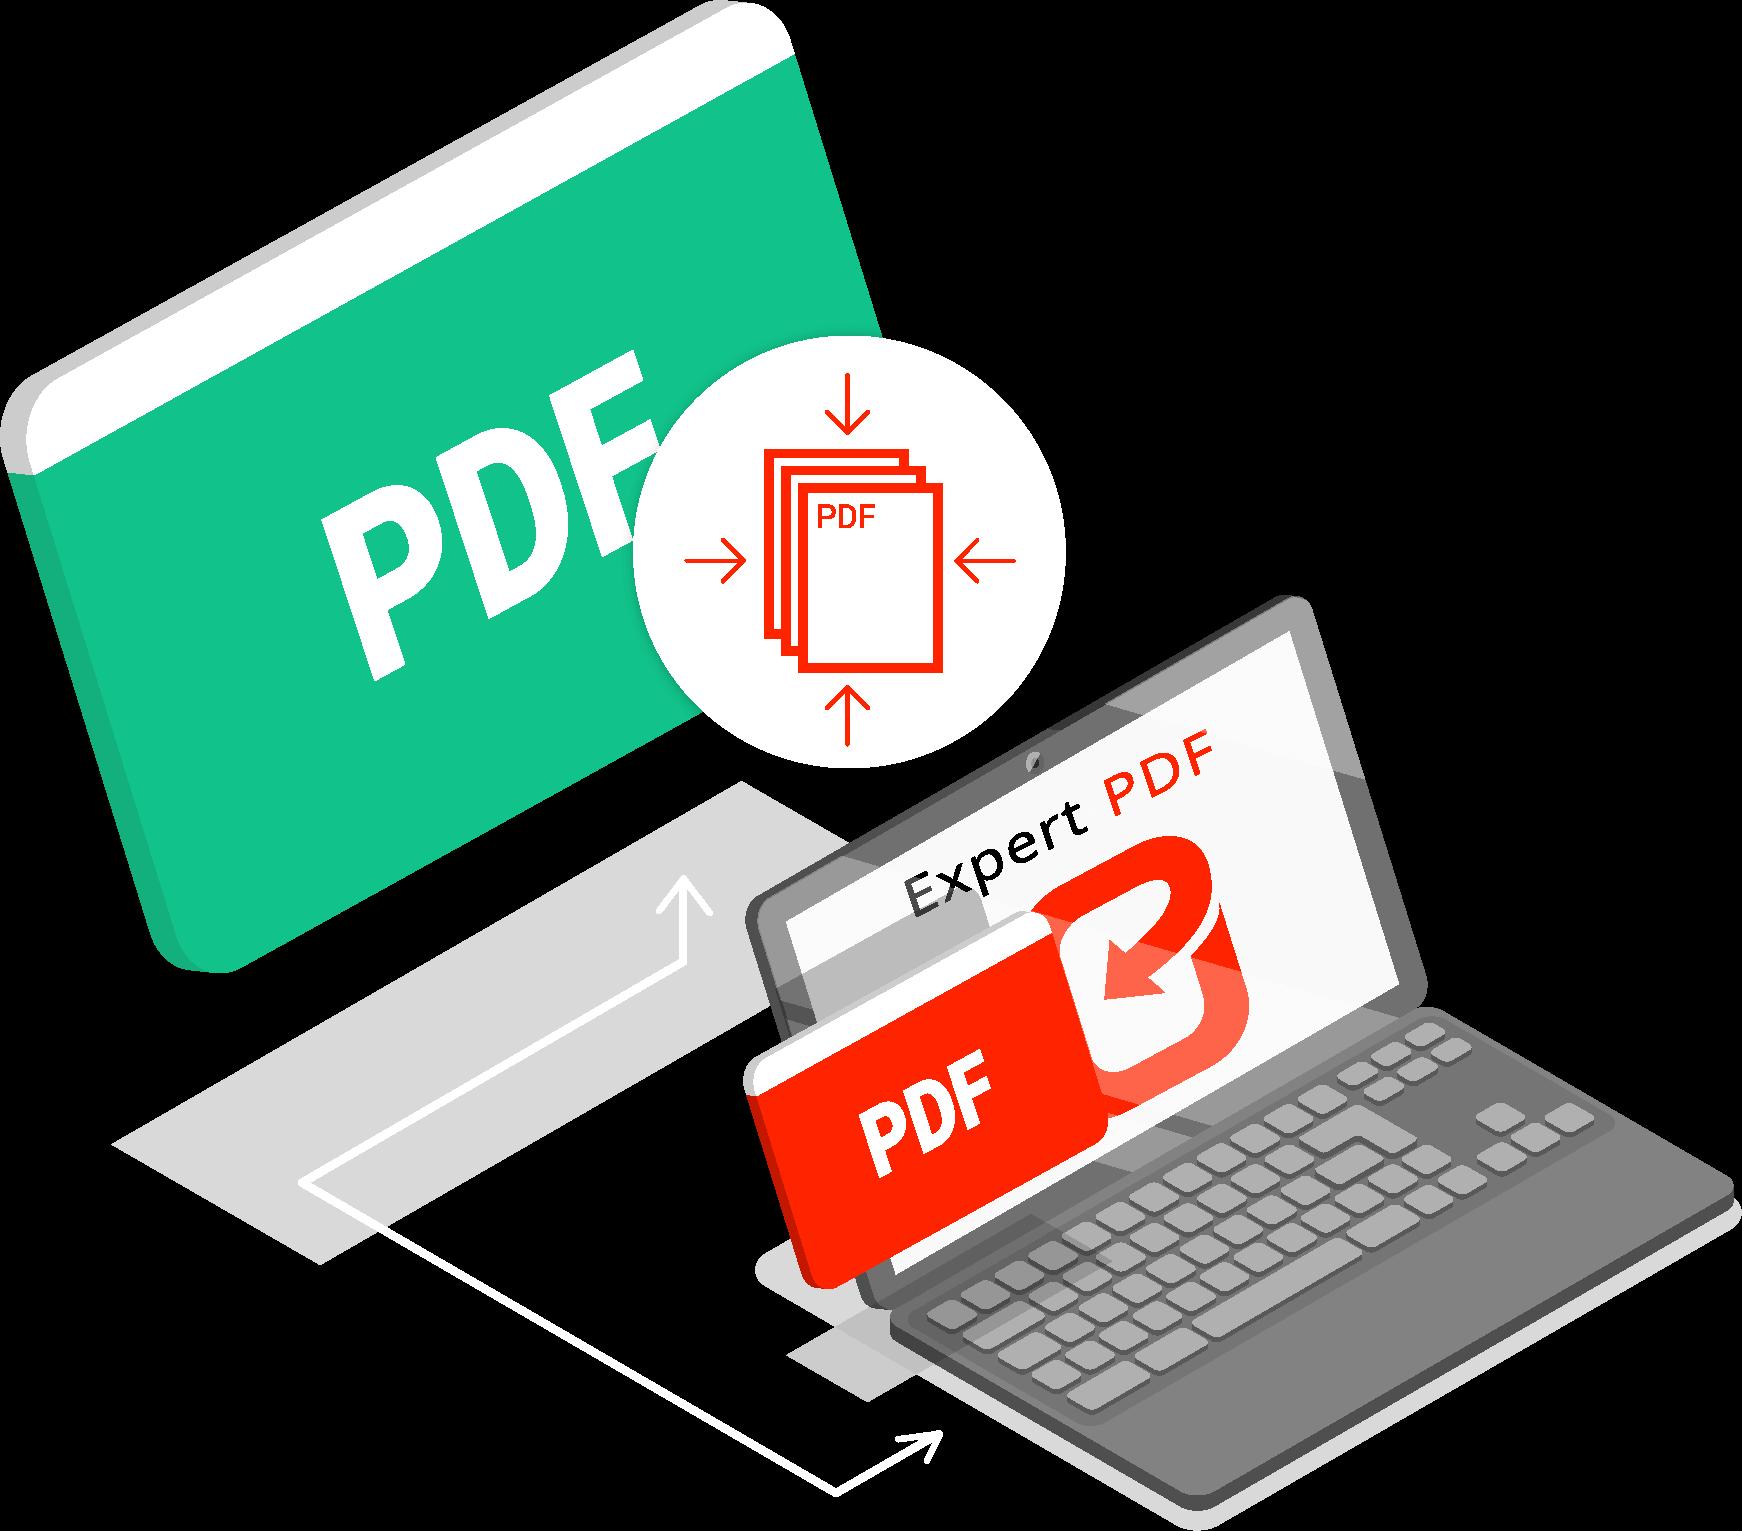 HUR MAN KOMPRIMERAR EN PDF-FIL MED EXPERT PDF